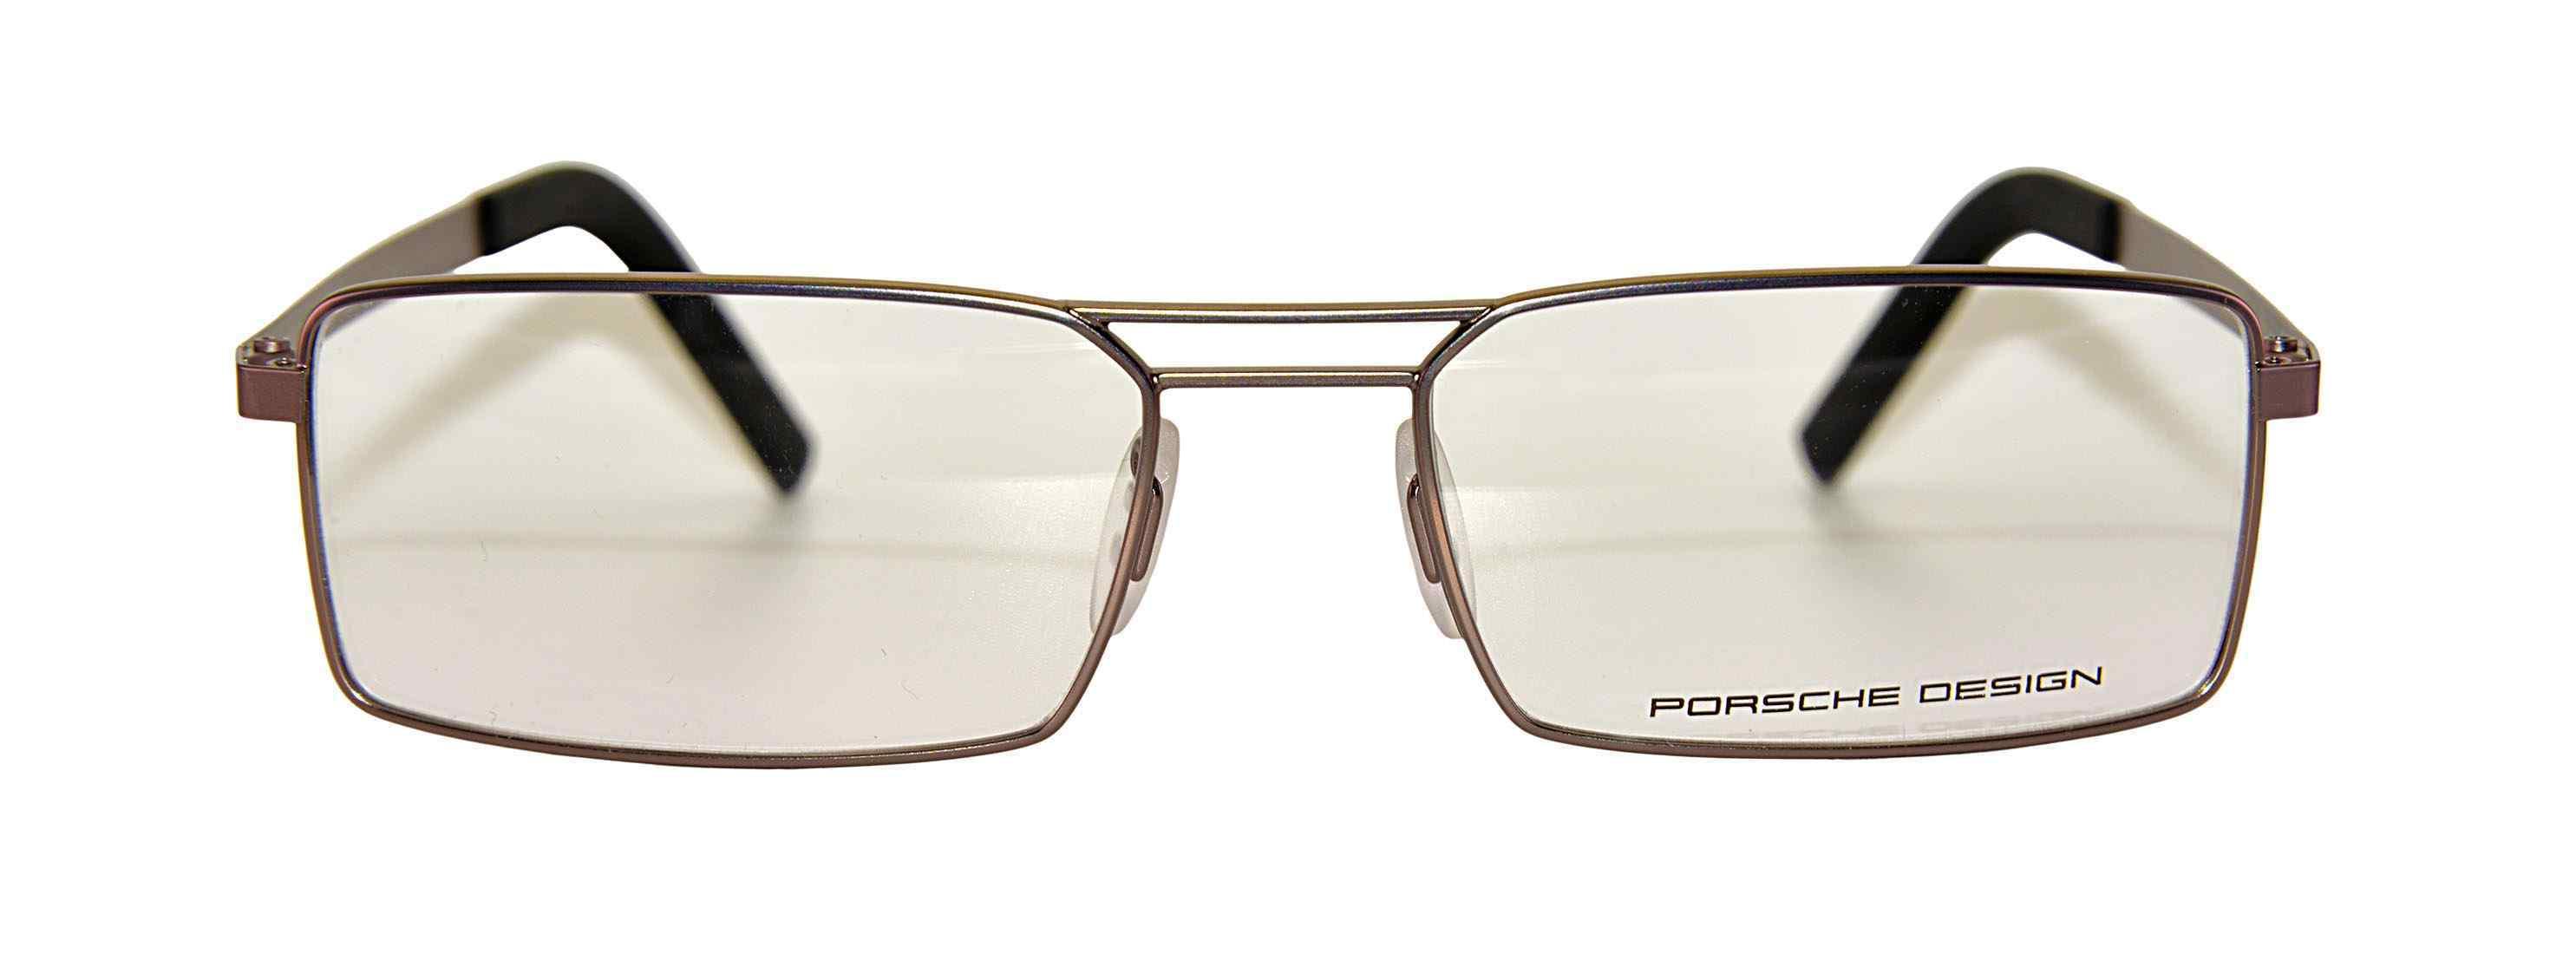 Porsche Design P 8282 B 01 2970x1100